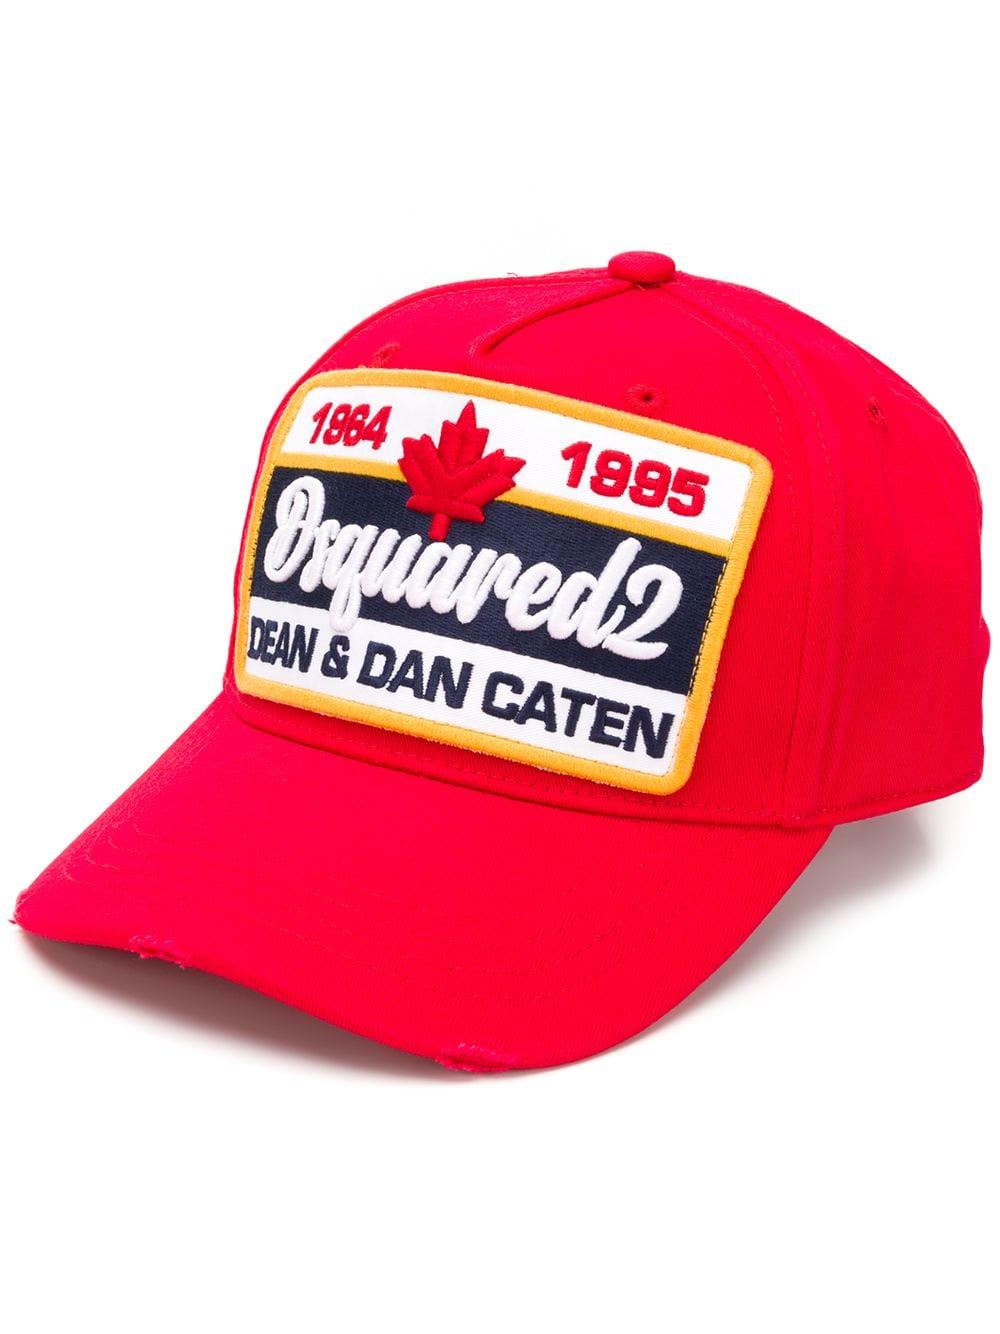 032d43e882ab3 Canadian Brothers Baseball Cap - DSQUARED2 - Russocapri